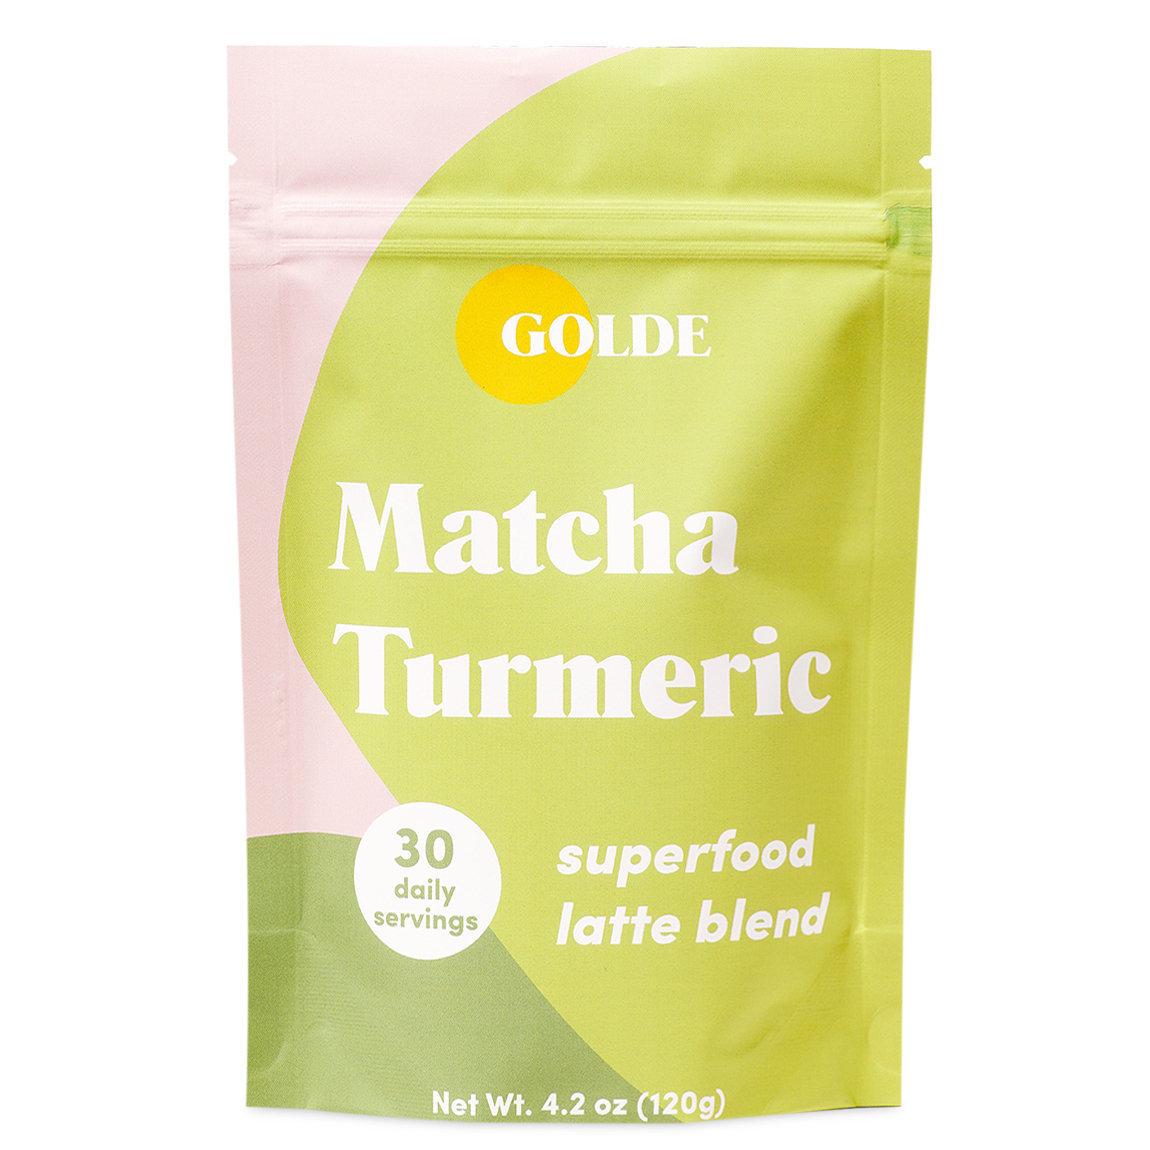 Golde Matcha Turmeric Latte Blend alternative view 1 - product swatch.